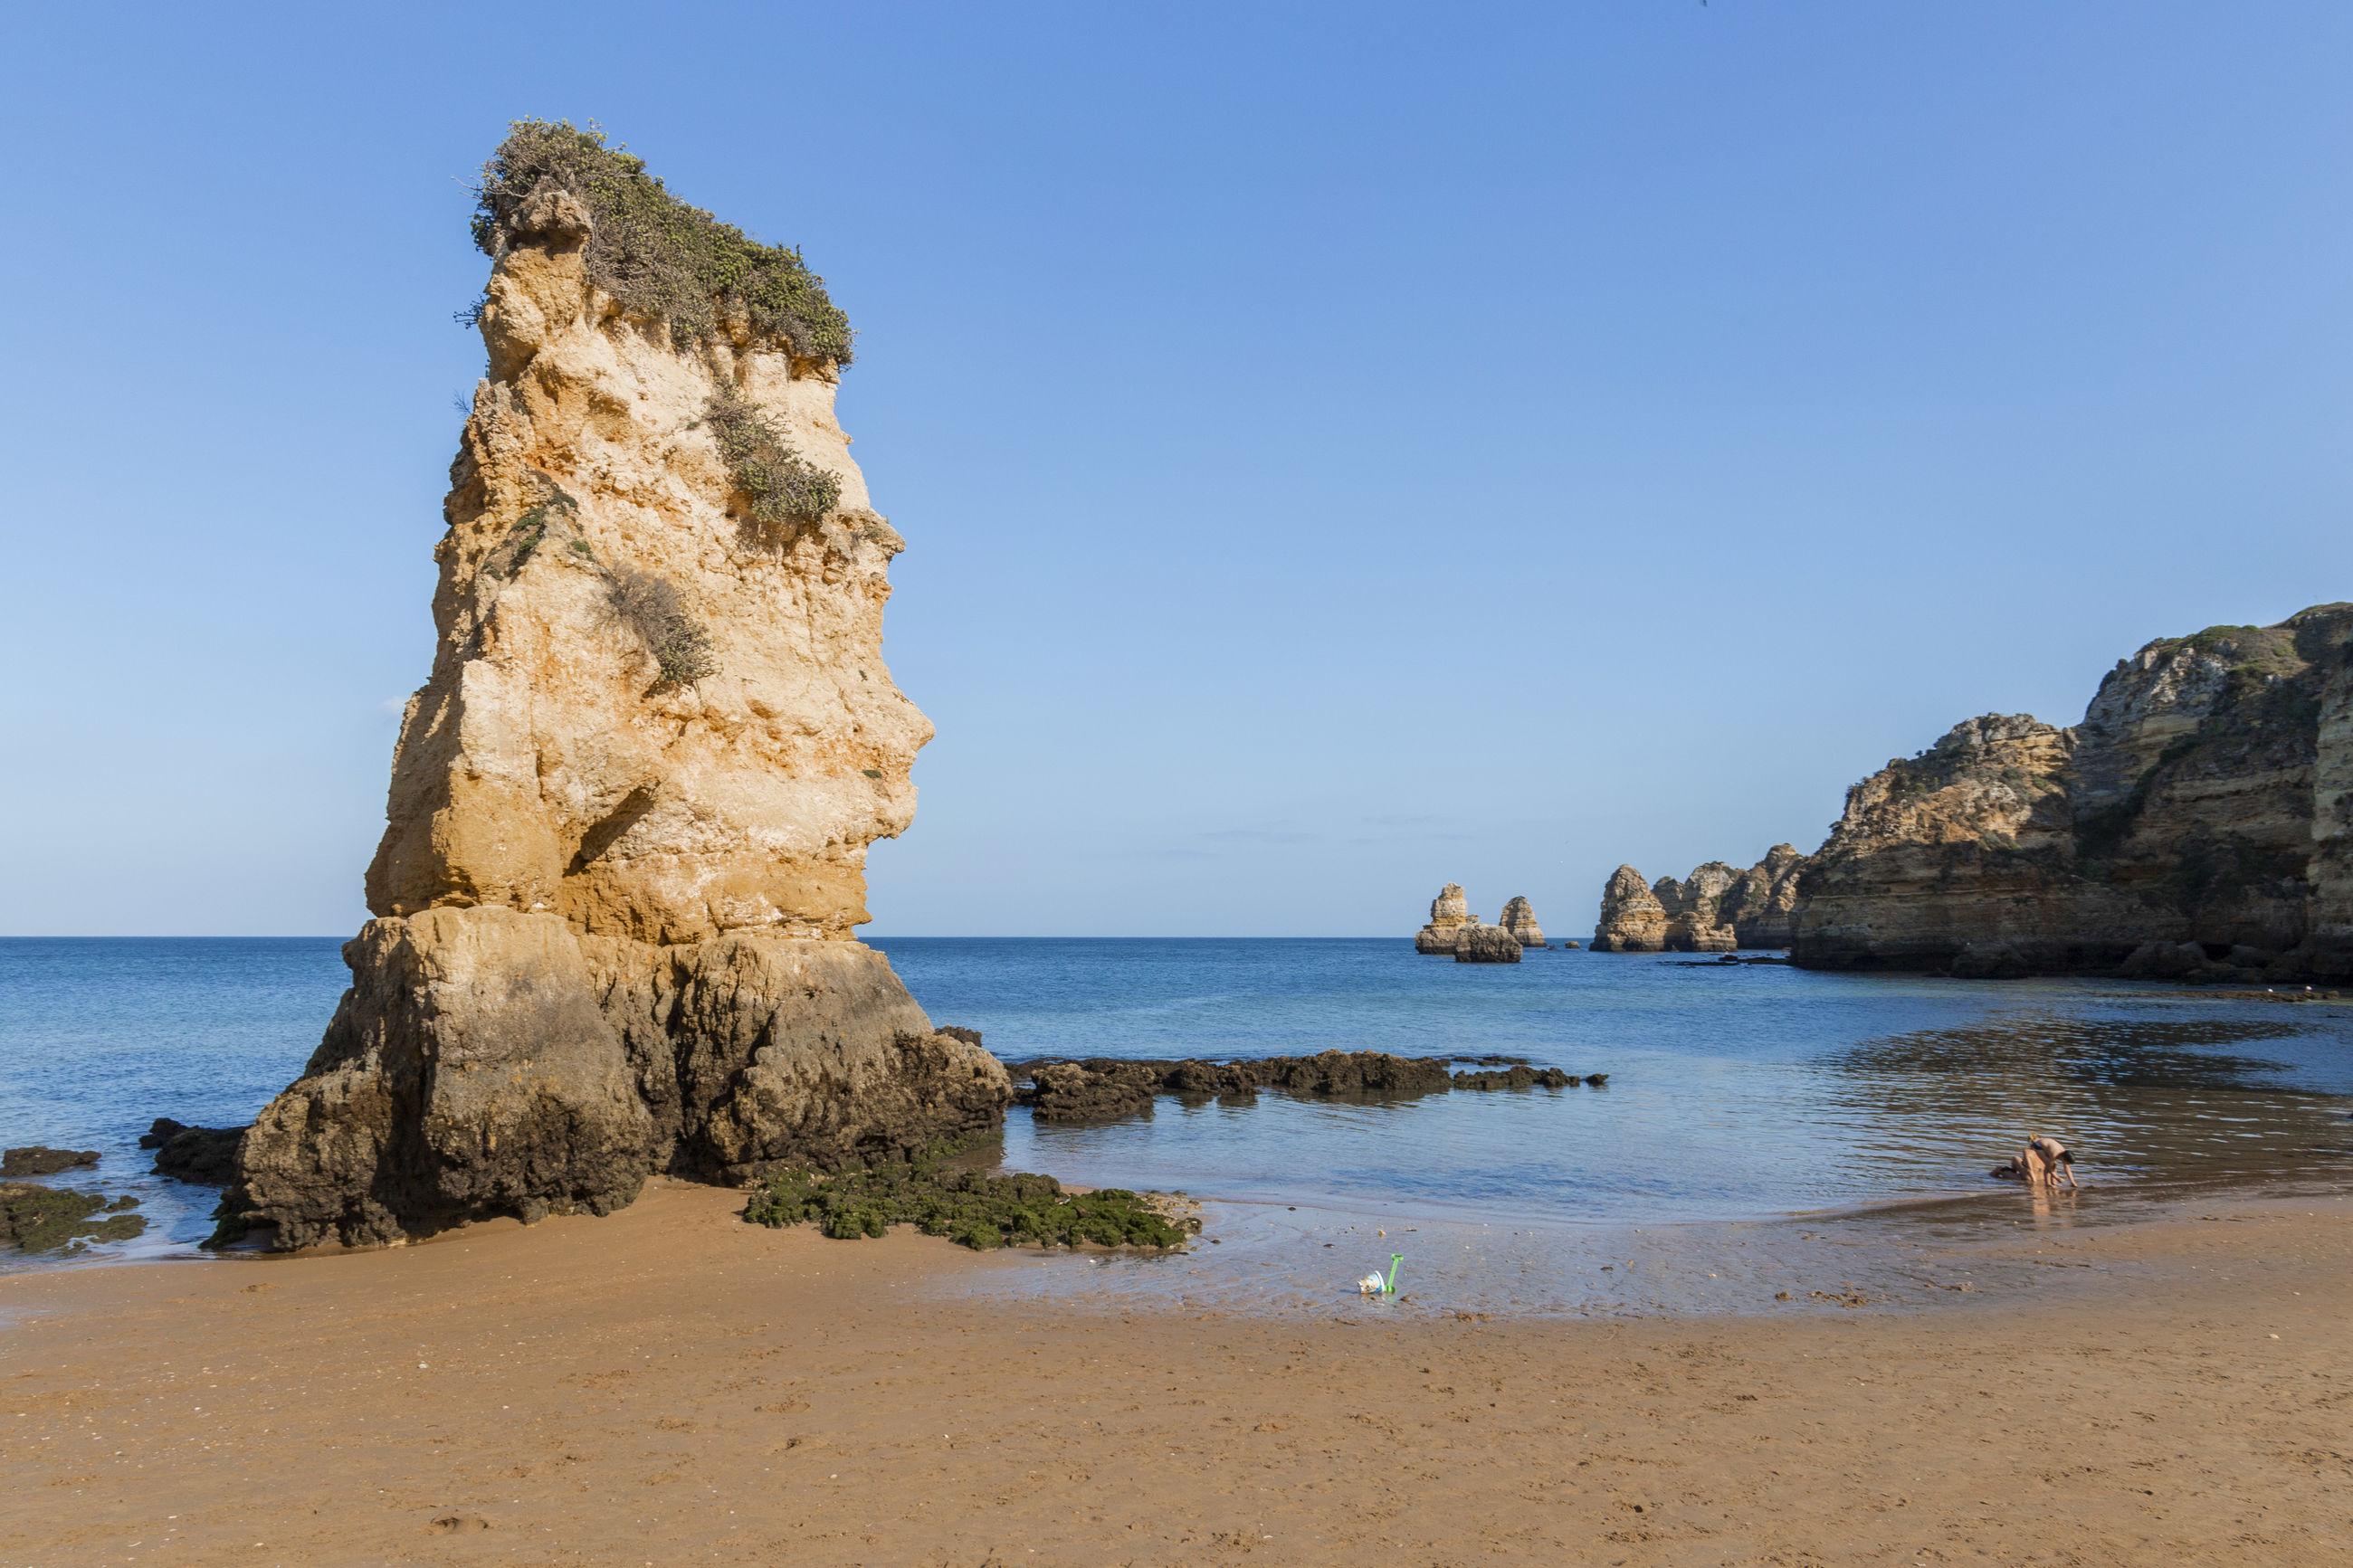 Rock formation on beach against clear blue sky